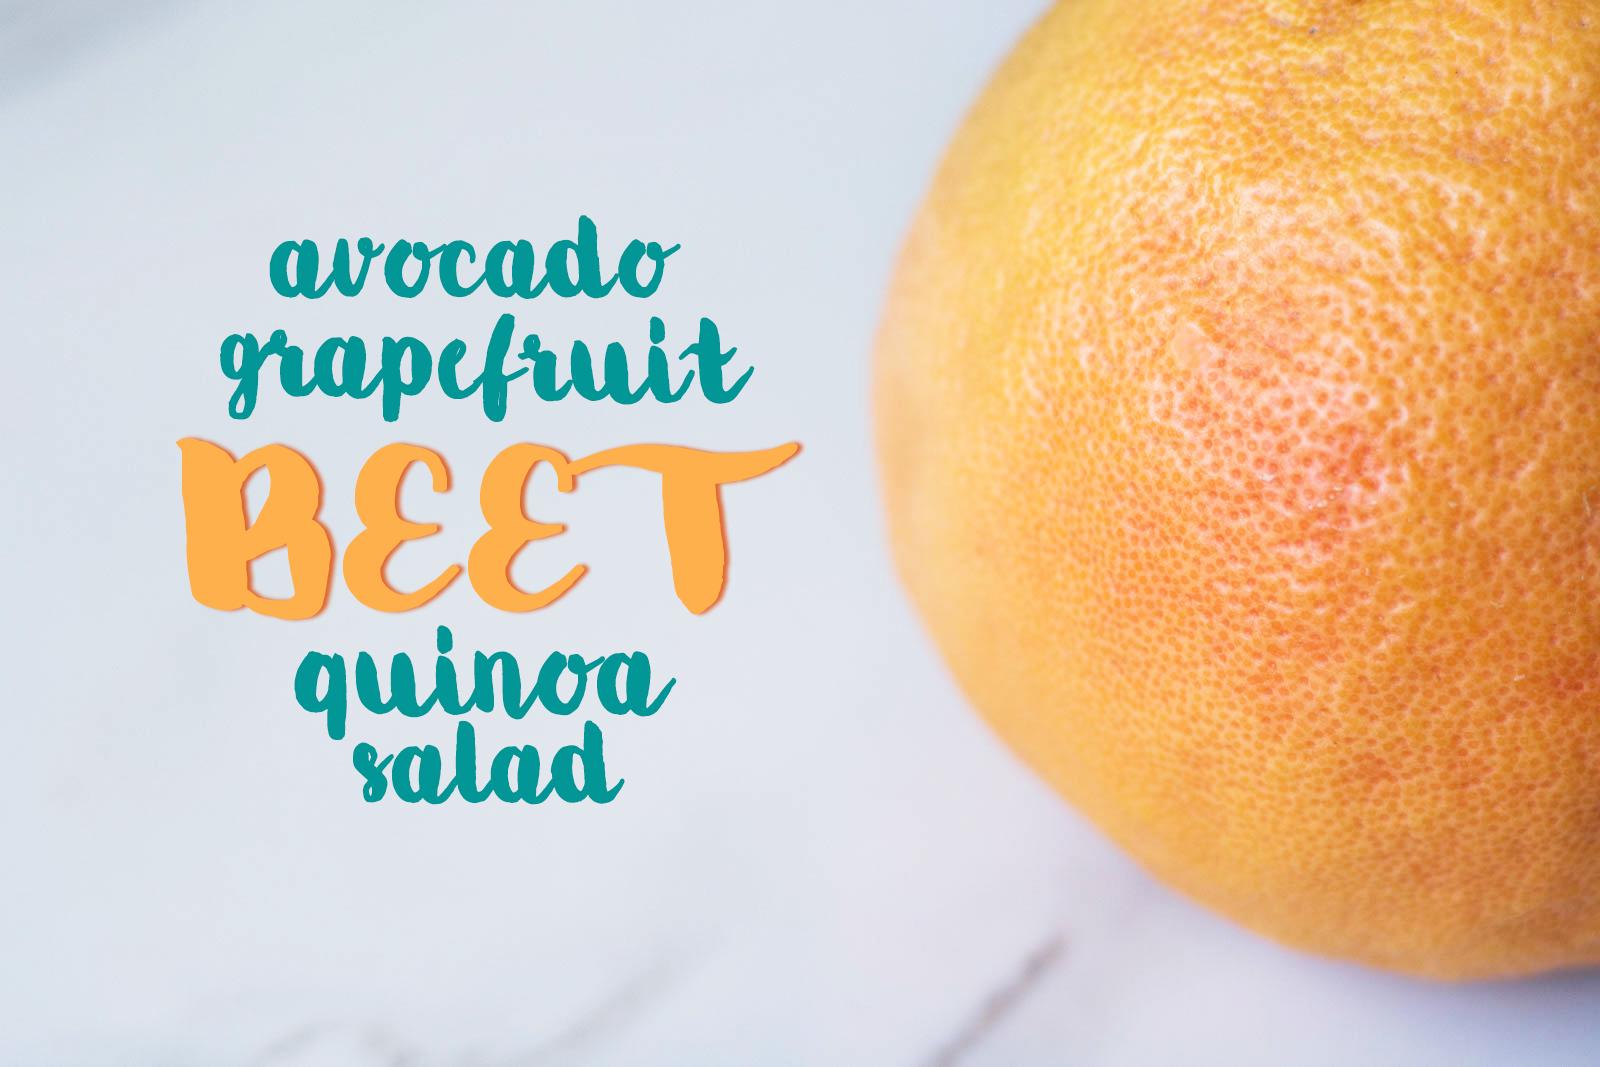 grapefruit beet quinoa salad